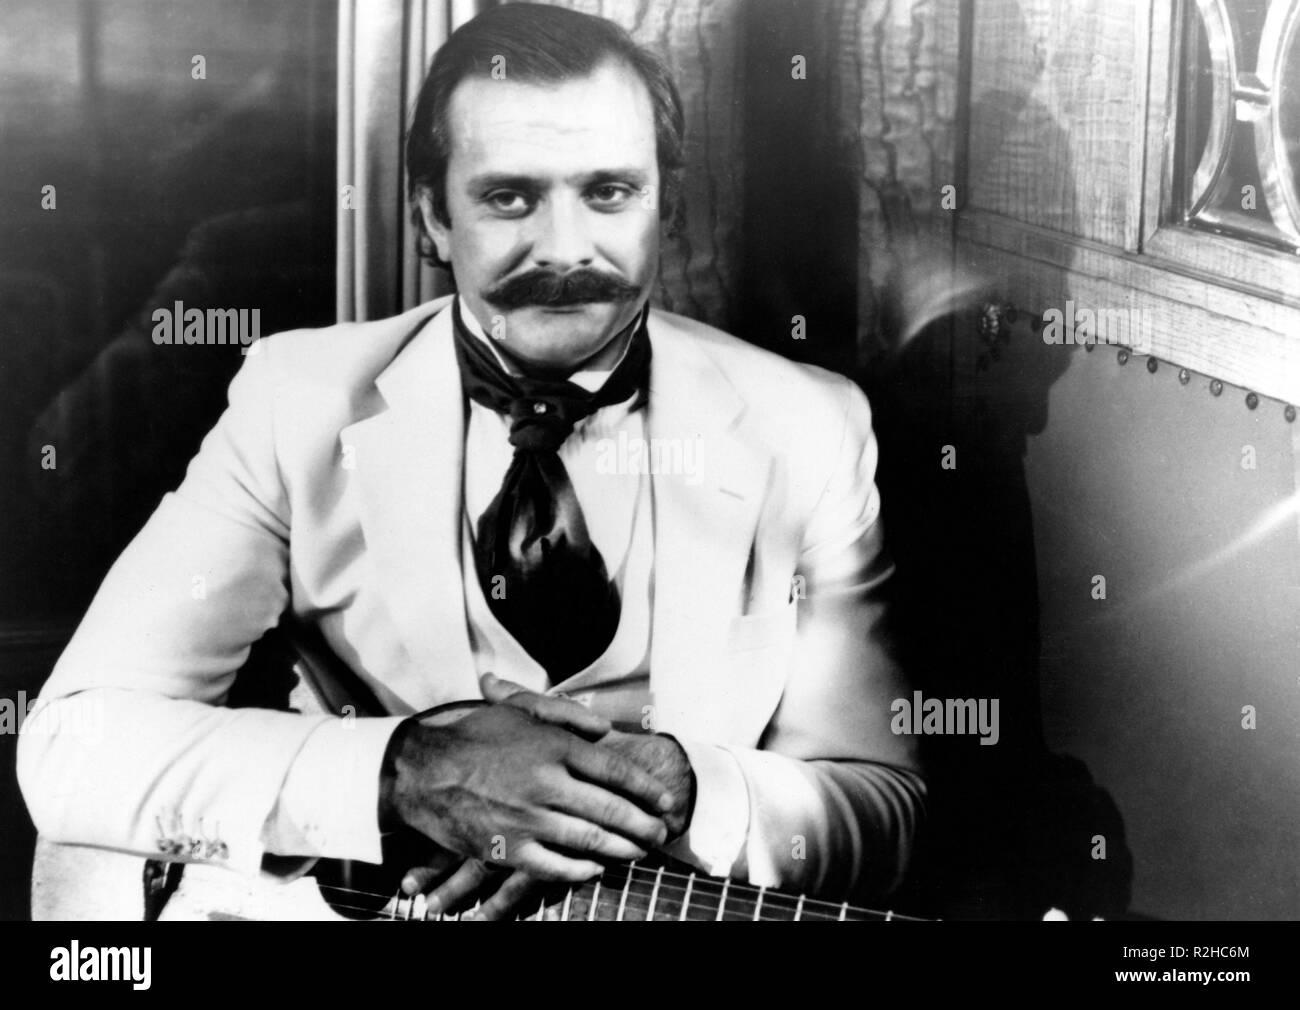 Zhestokiy romans A Cruel Romance Year : 1984 Soviet Union Director : Eldar Riazanov Nikita Mikhalkov - Stock Image